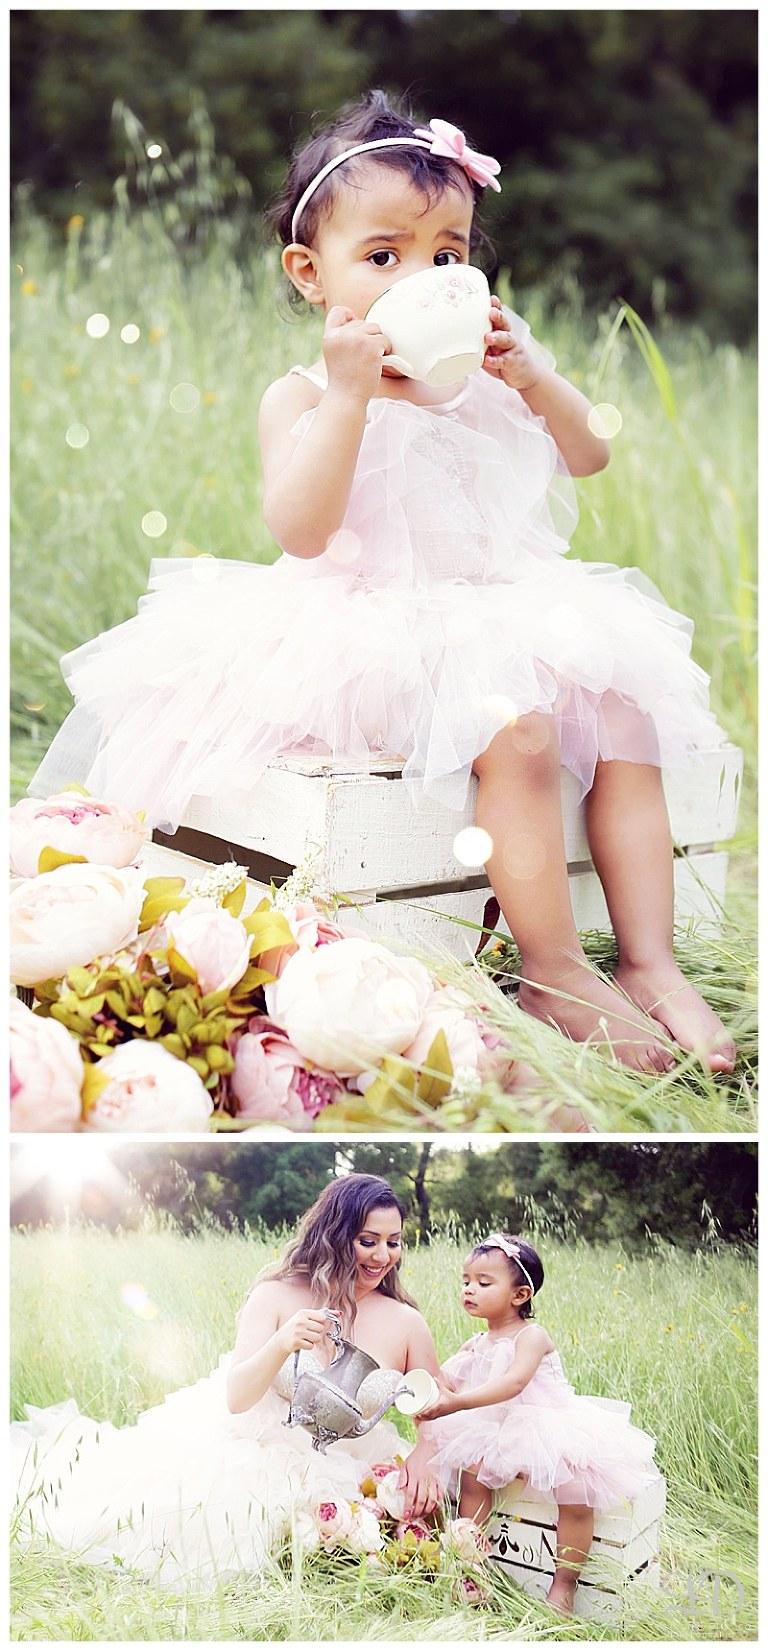 sweet maternity photoshoot-lori dorman photography-maternity boudoir-professional photographer_6103.jpg